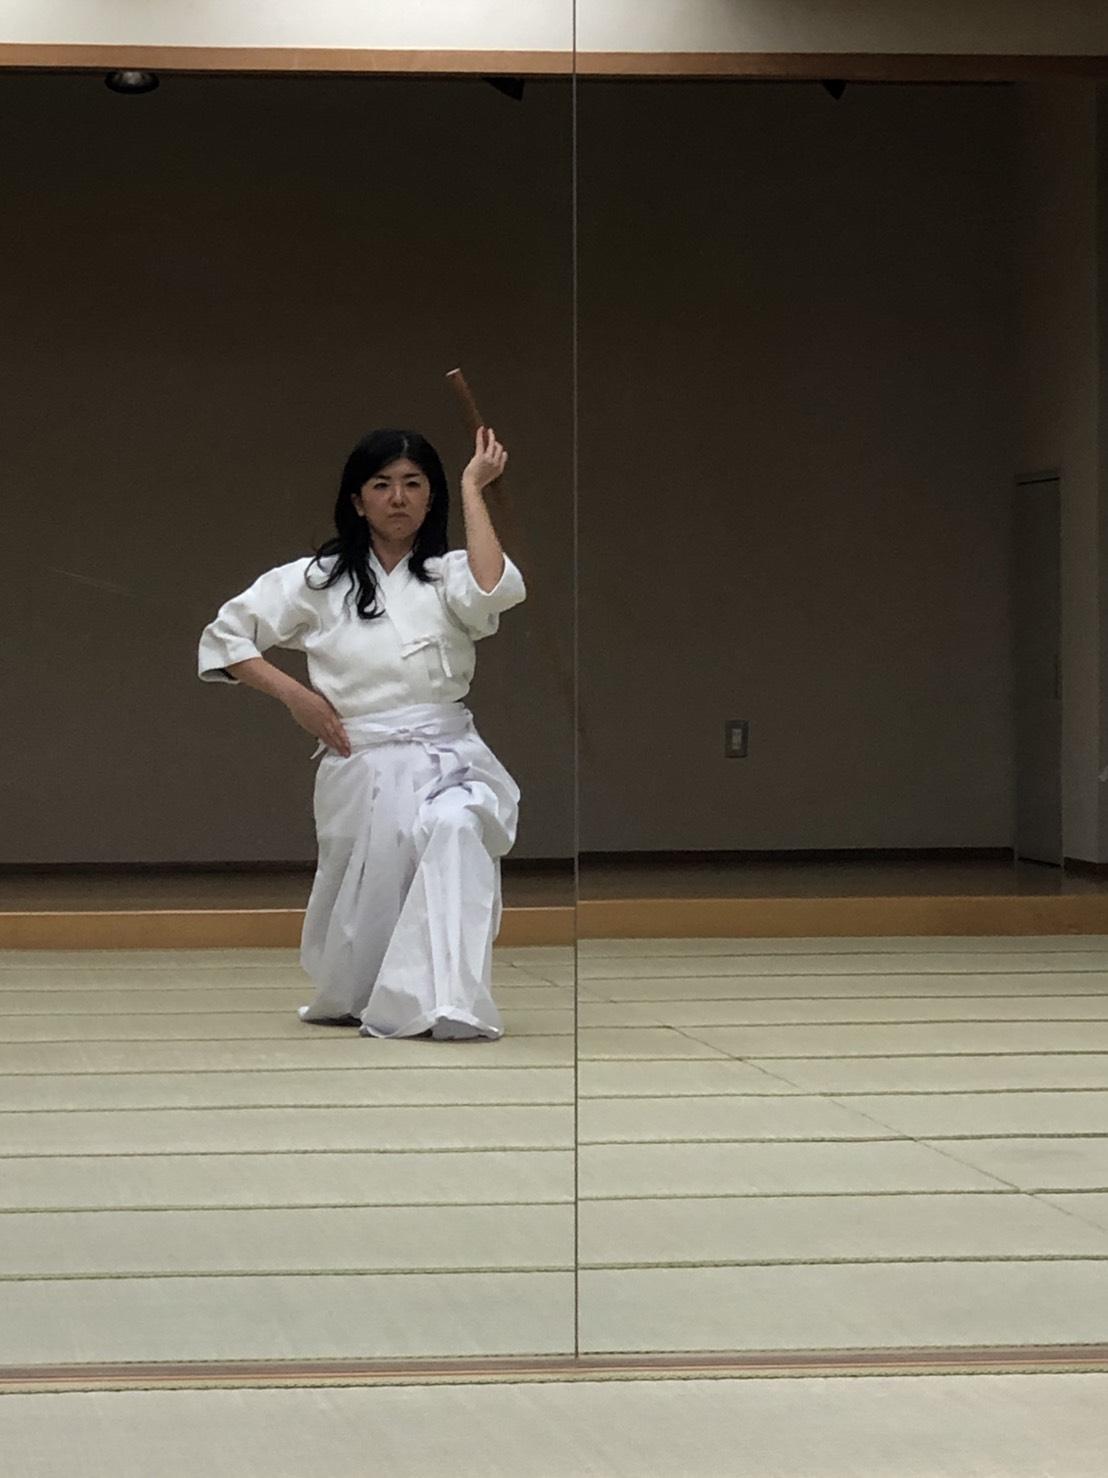 S  85254215 - 釈正輪老師、武道礼法&呼吸法開催